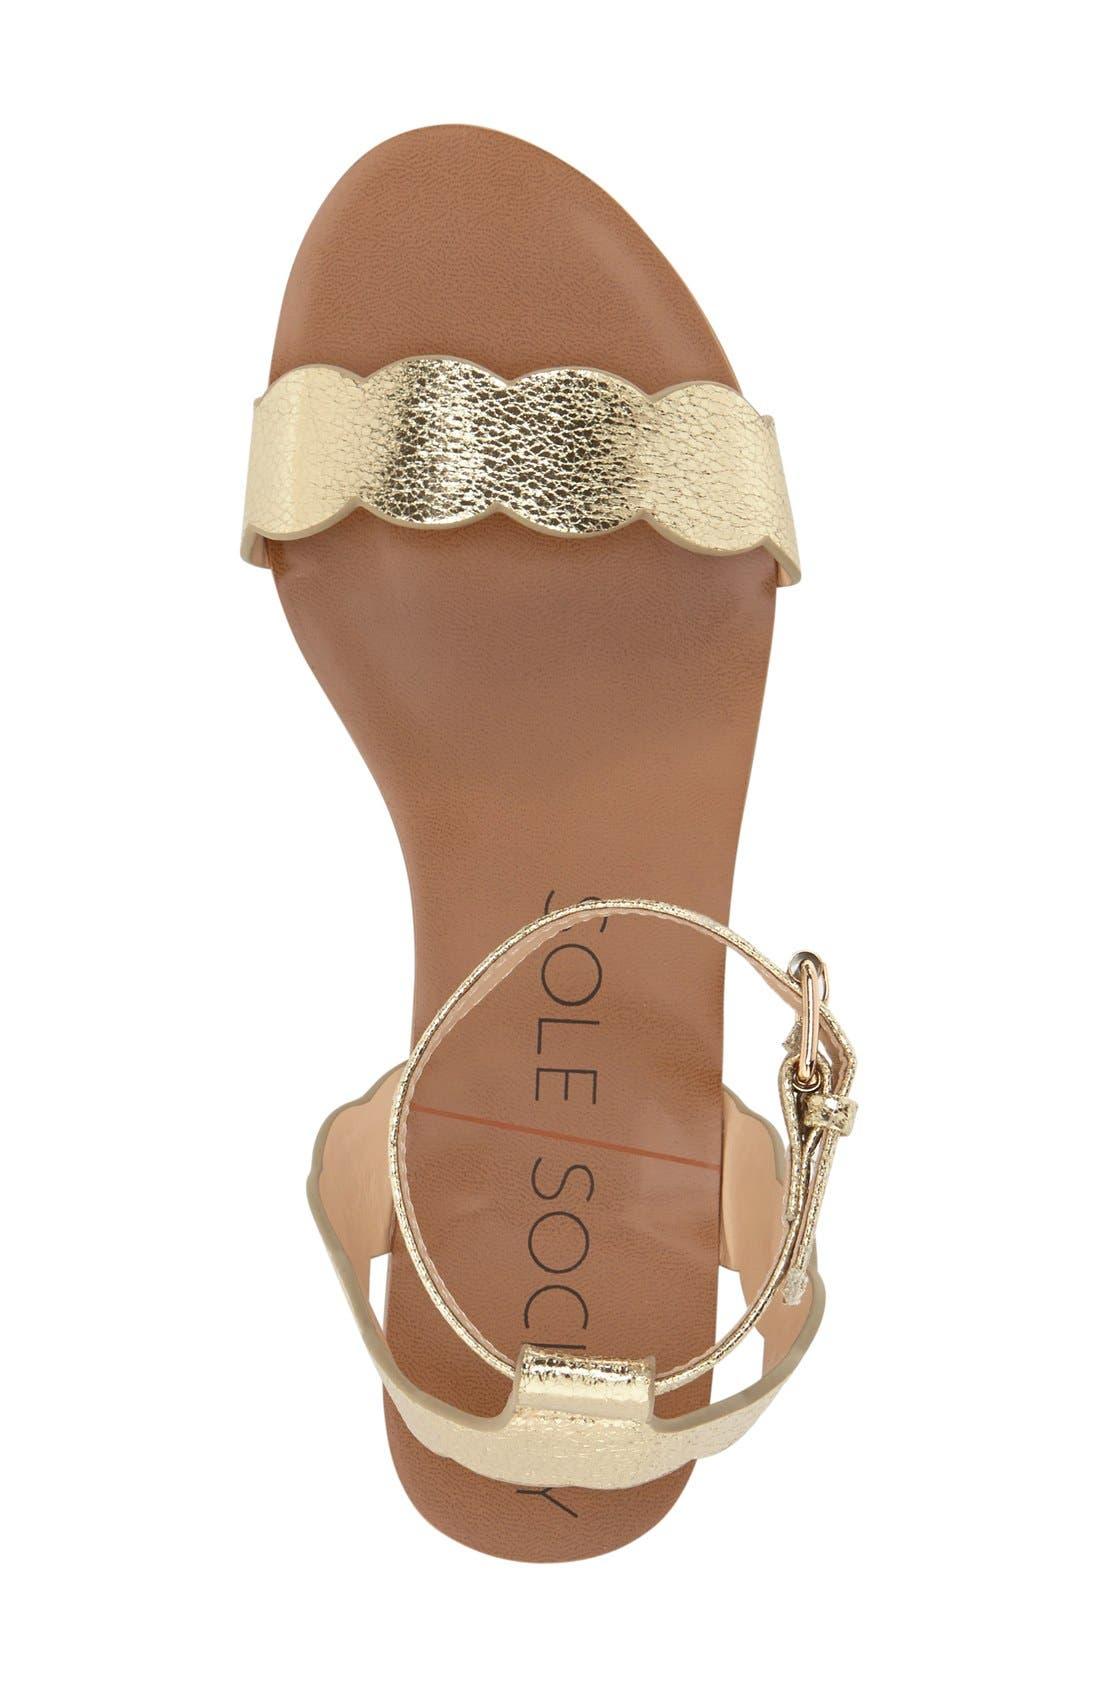 'Odette' Scalloped Ankle Strap Flat Sandal,                             Alternate thumbnail 28, color,